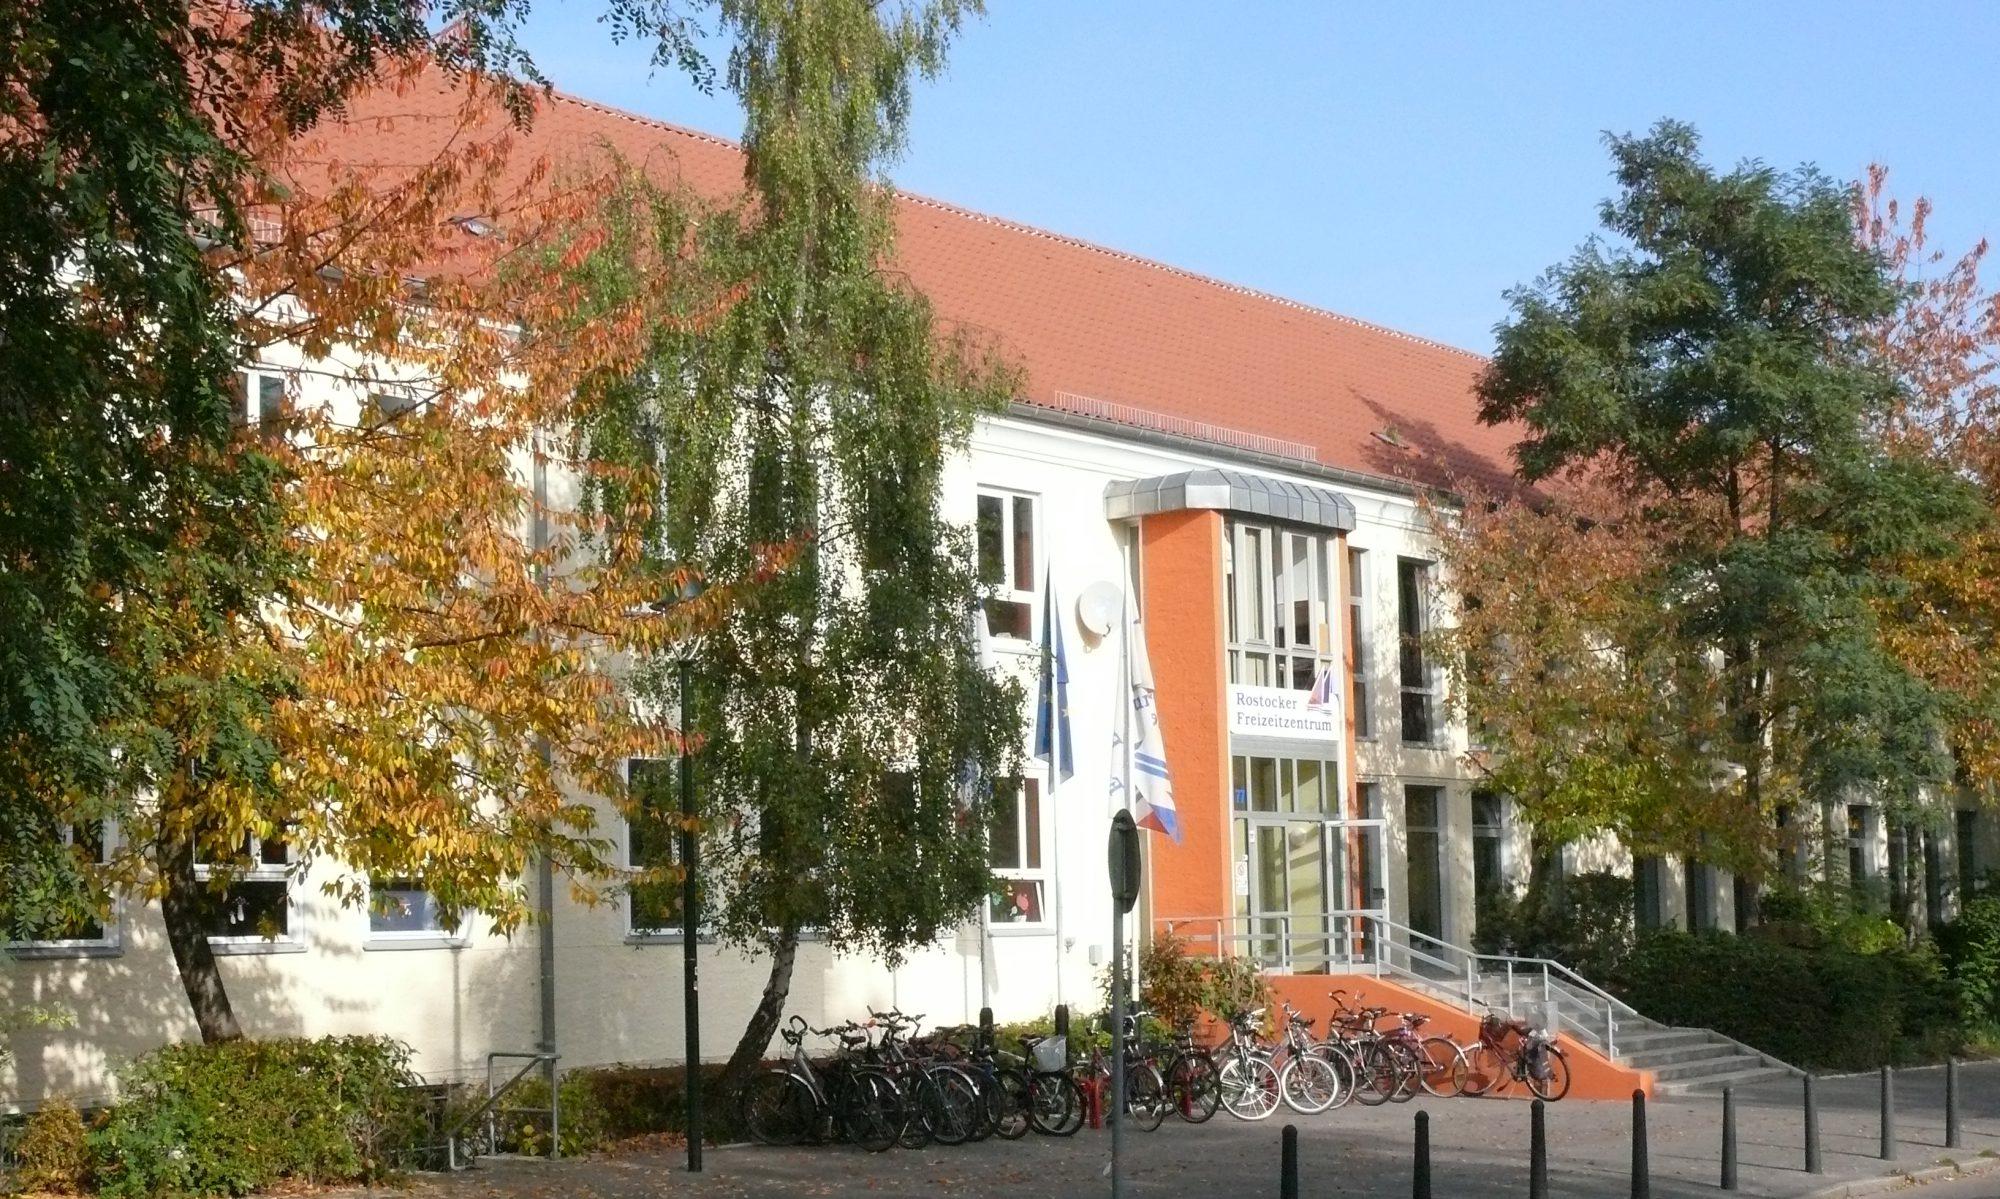 Rostocker Freizeitzentrum E.V.